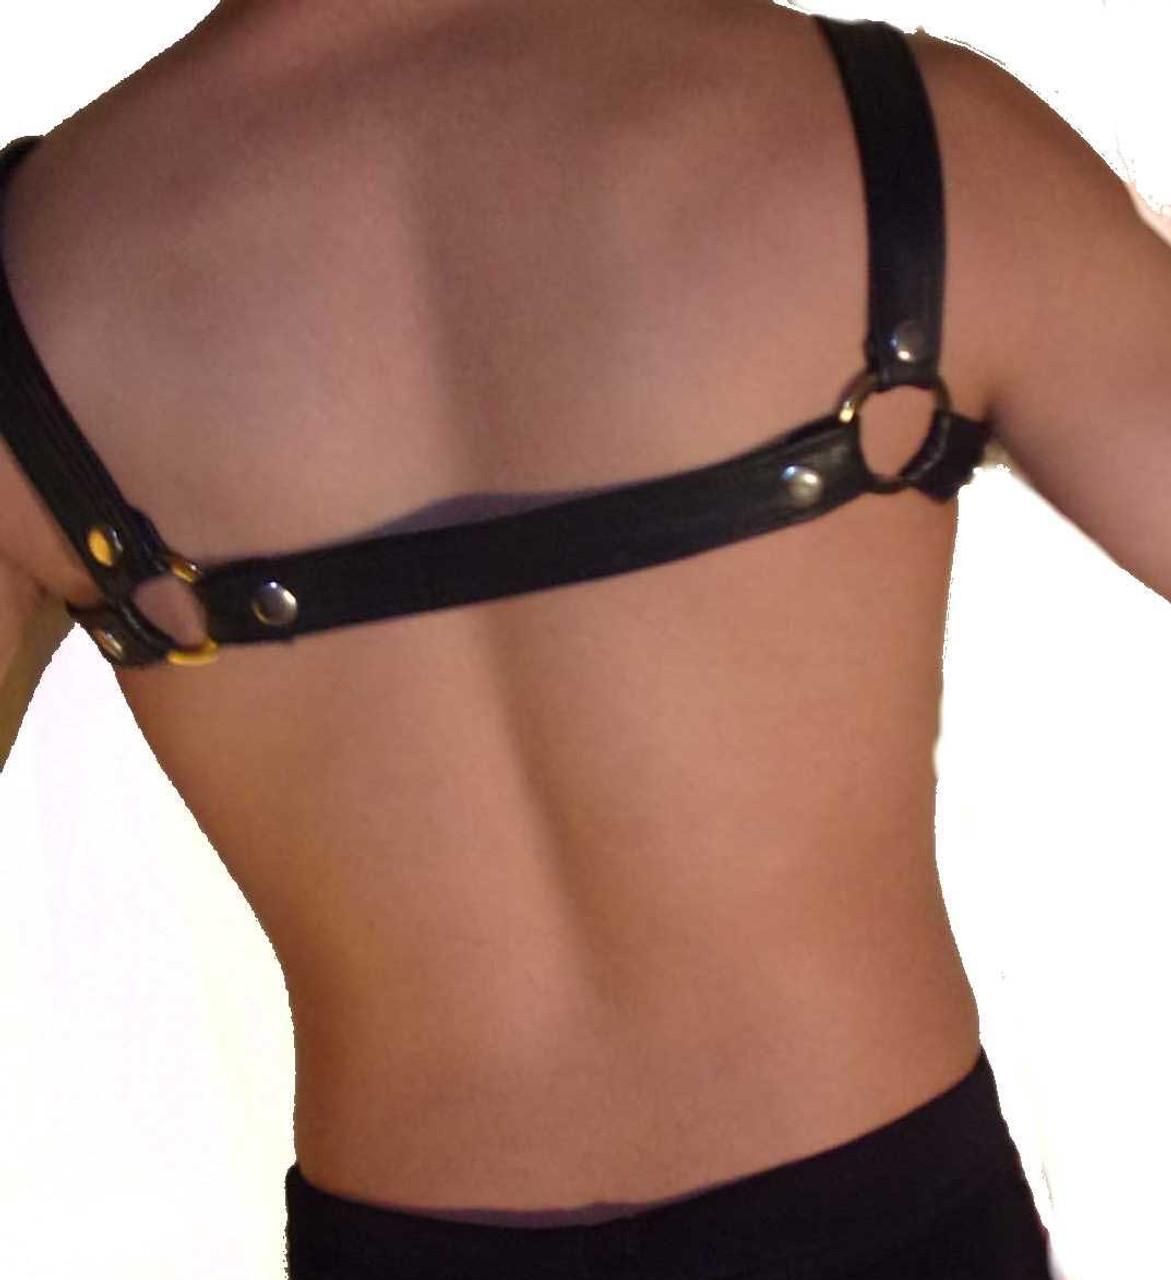 pec harness